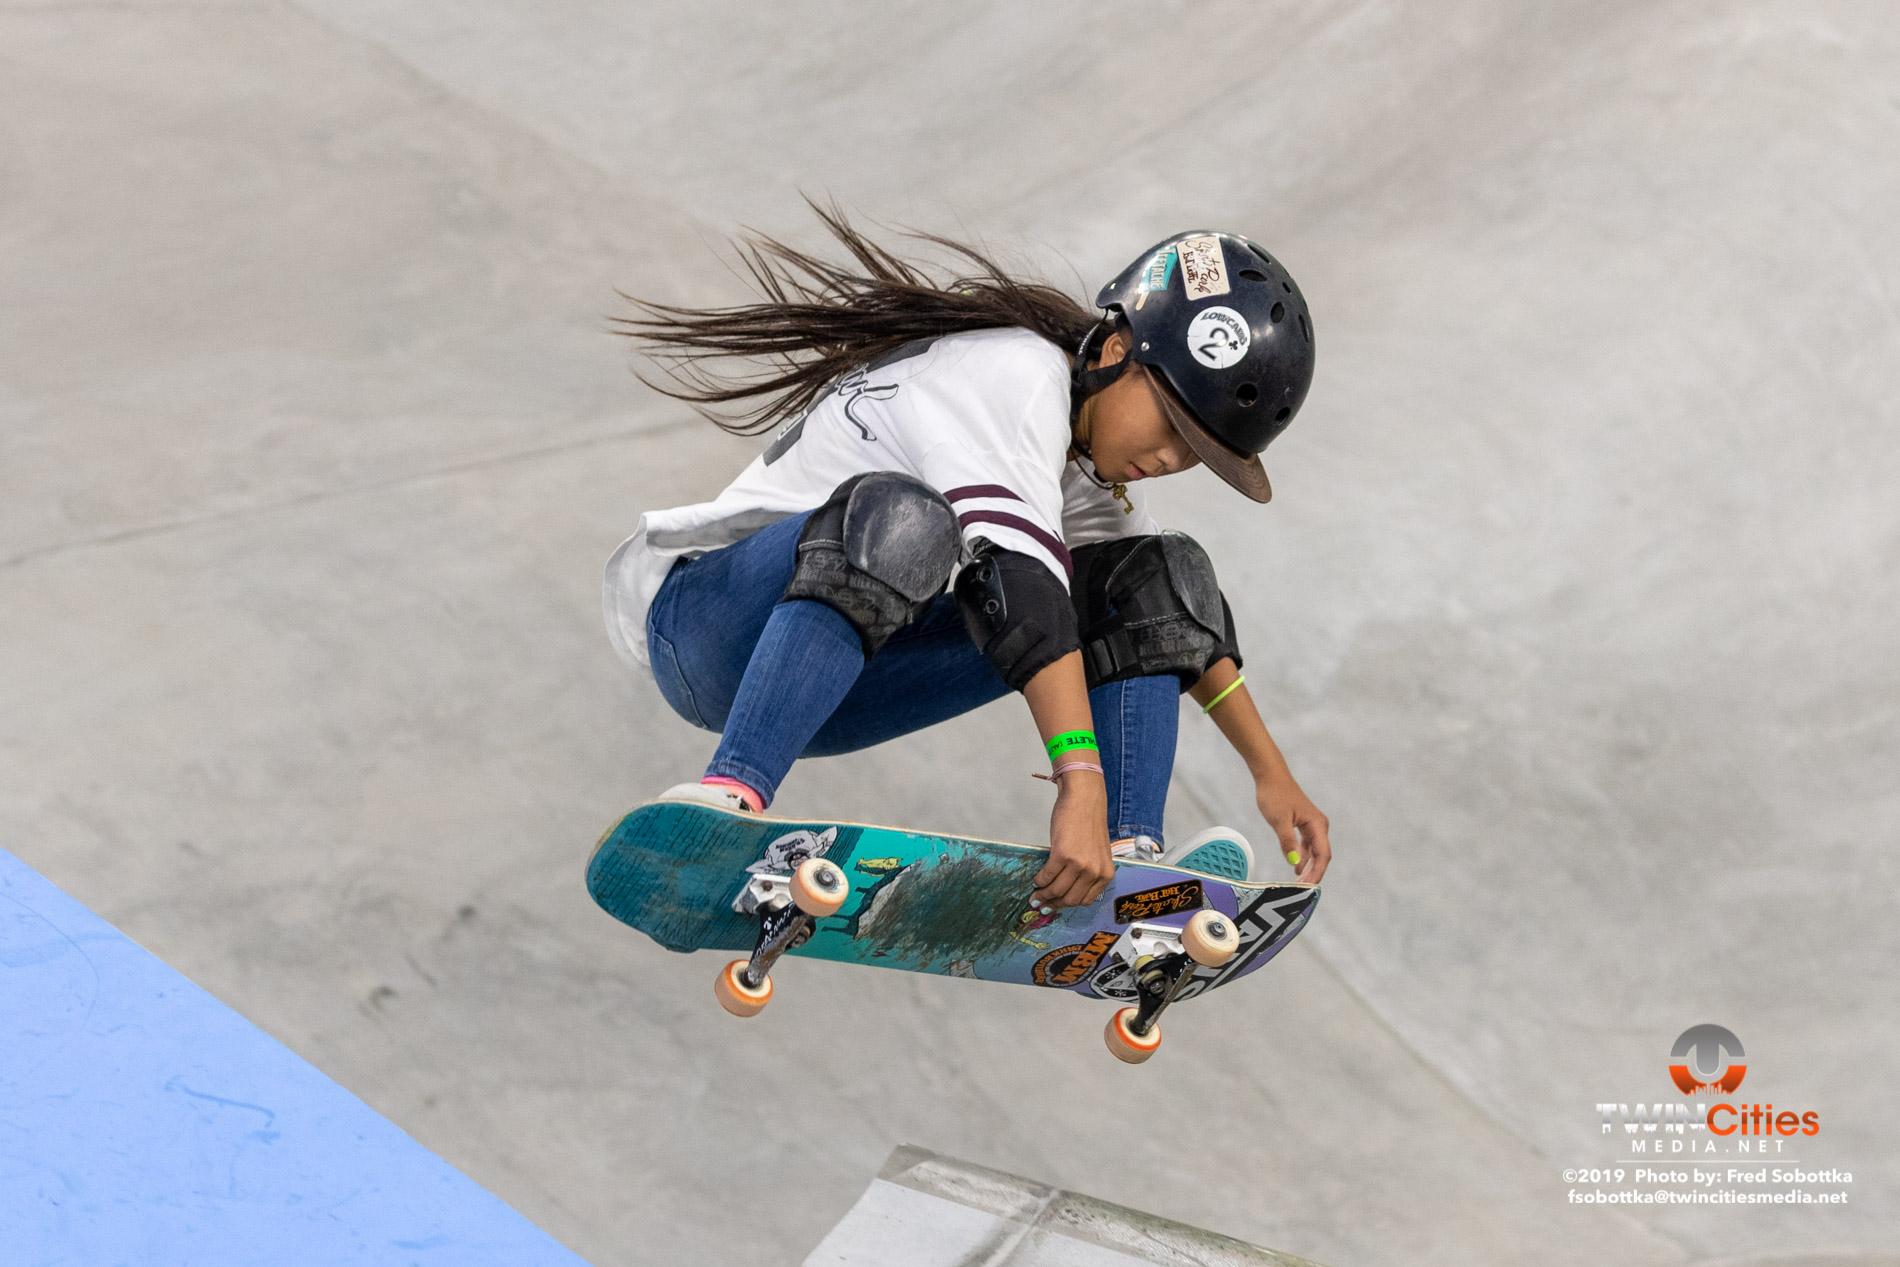 Womens-Skateboard-Park-03